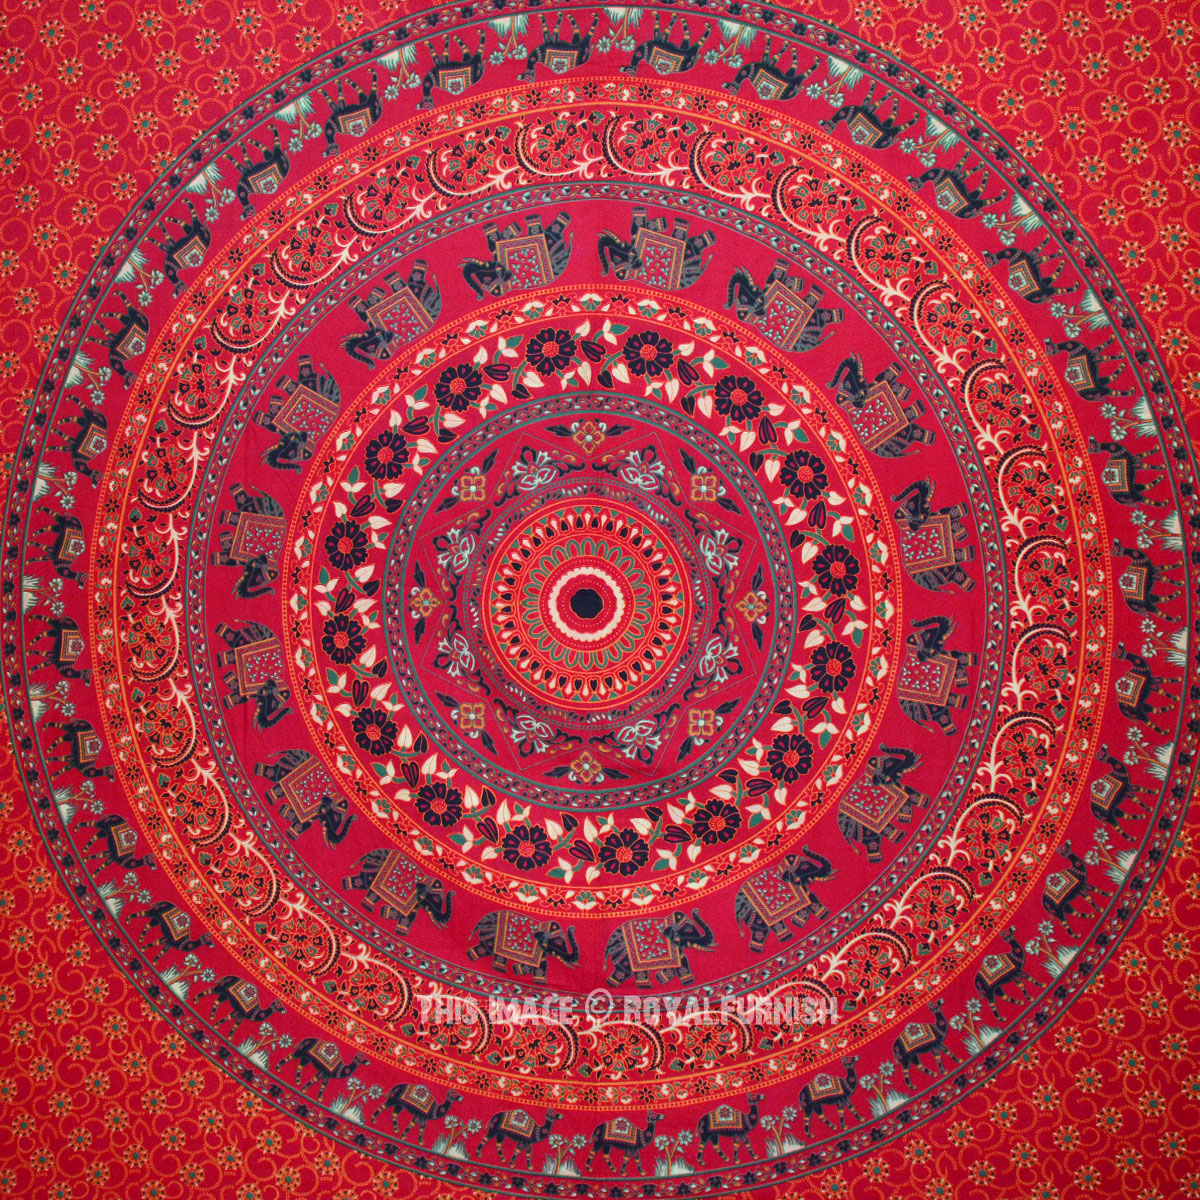 Red Multi Elephants & Camels Medallion Mandala Wall Tapestry - RoyalFurnish.com